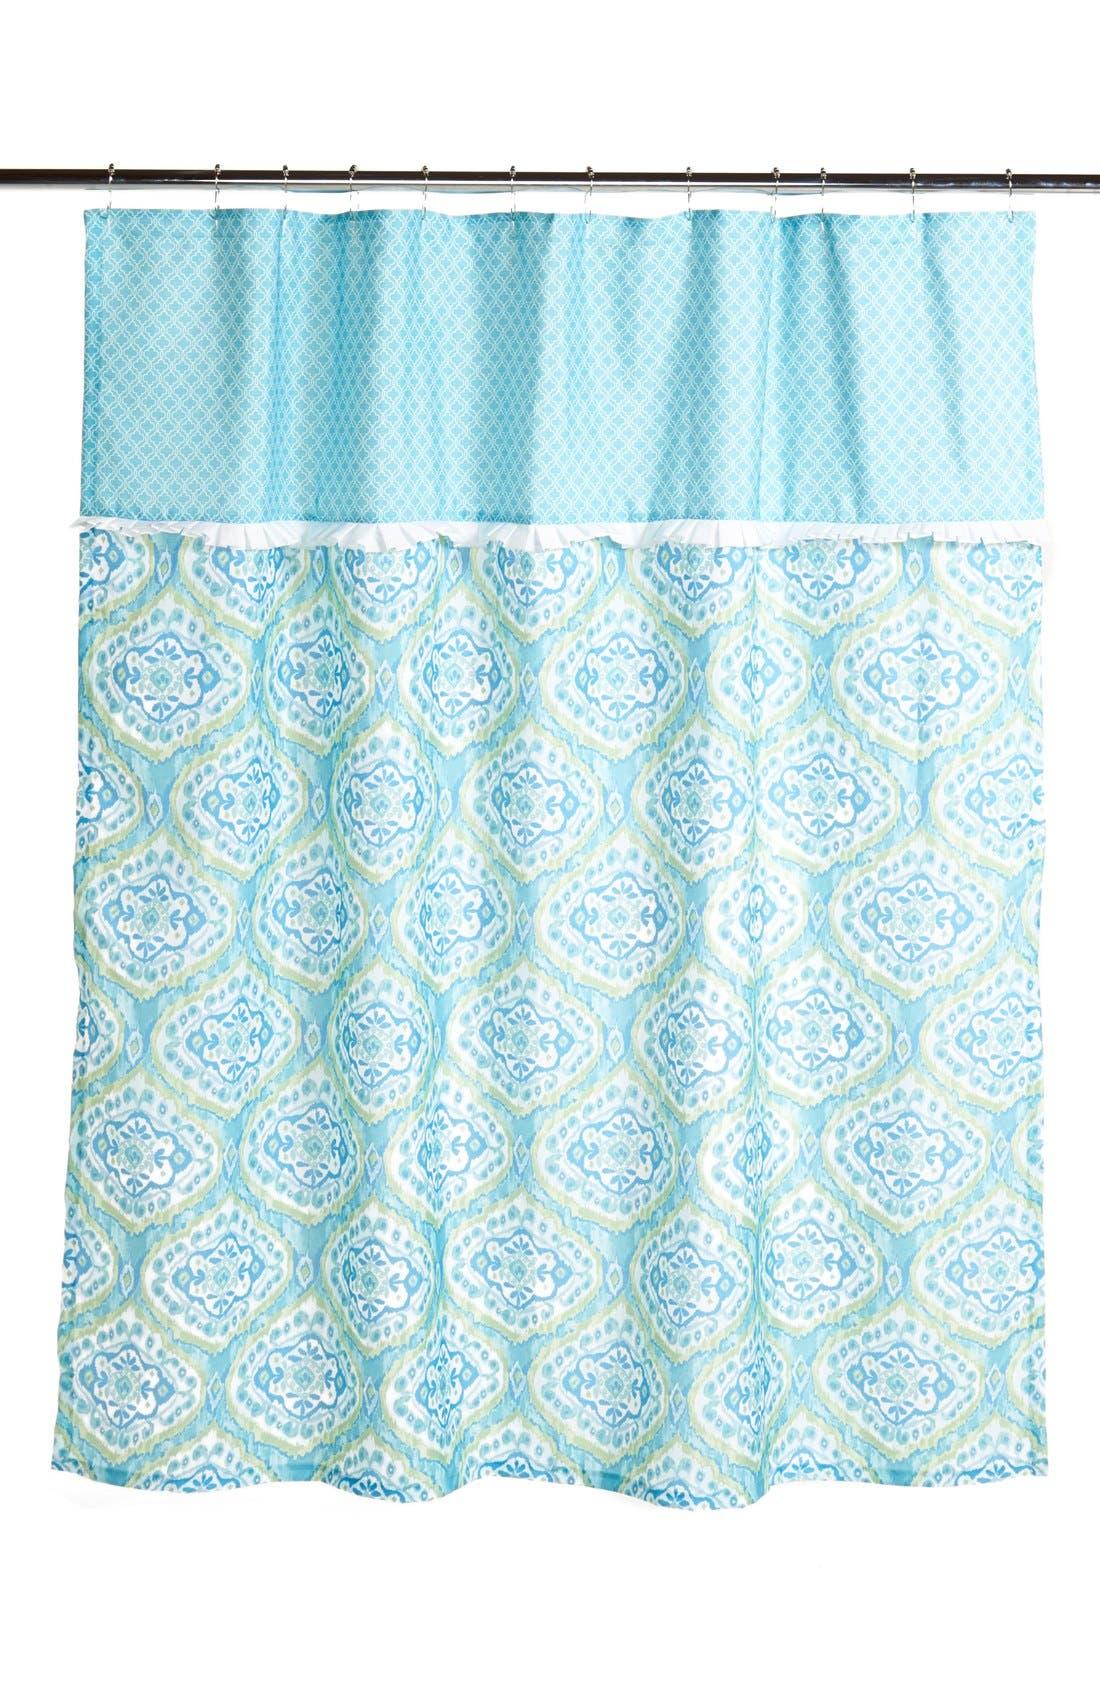 dena home shower curtain